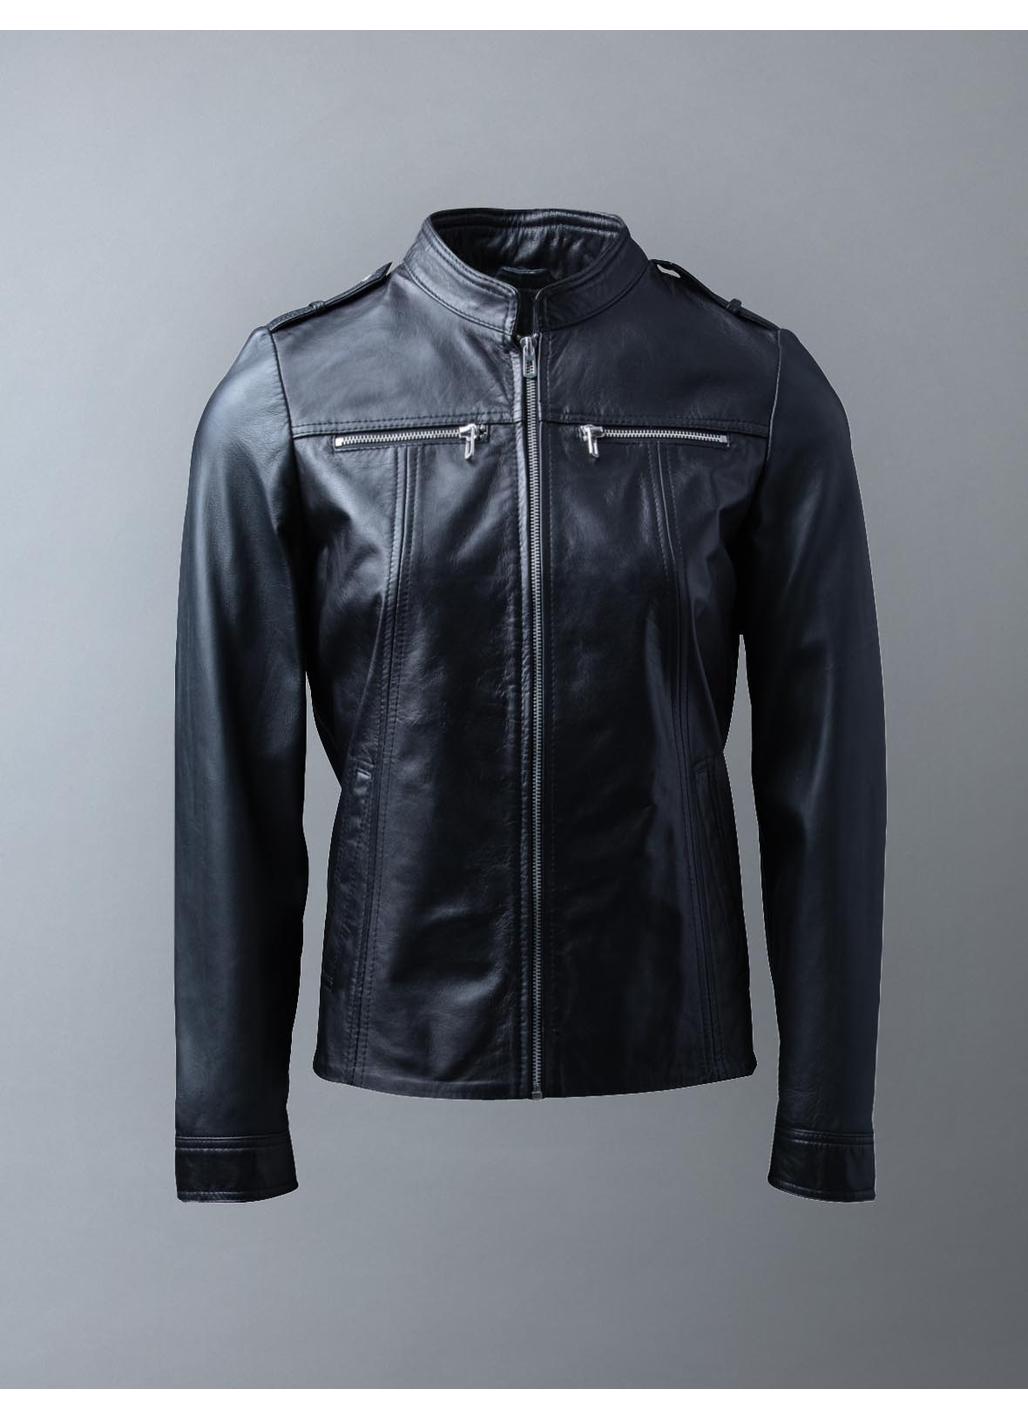 Tarn Leather Jacket in Black